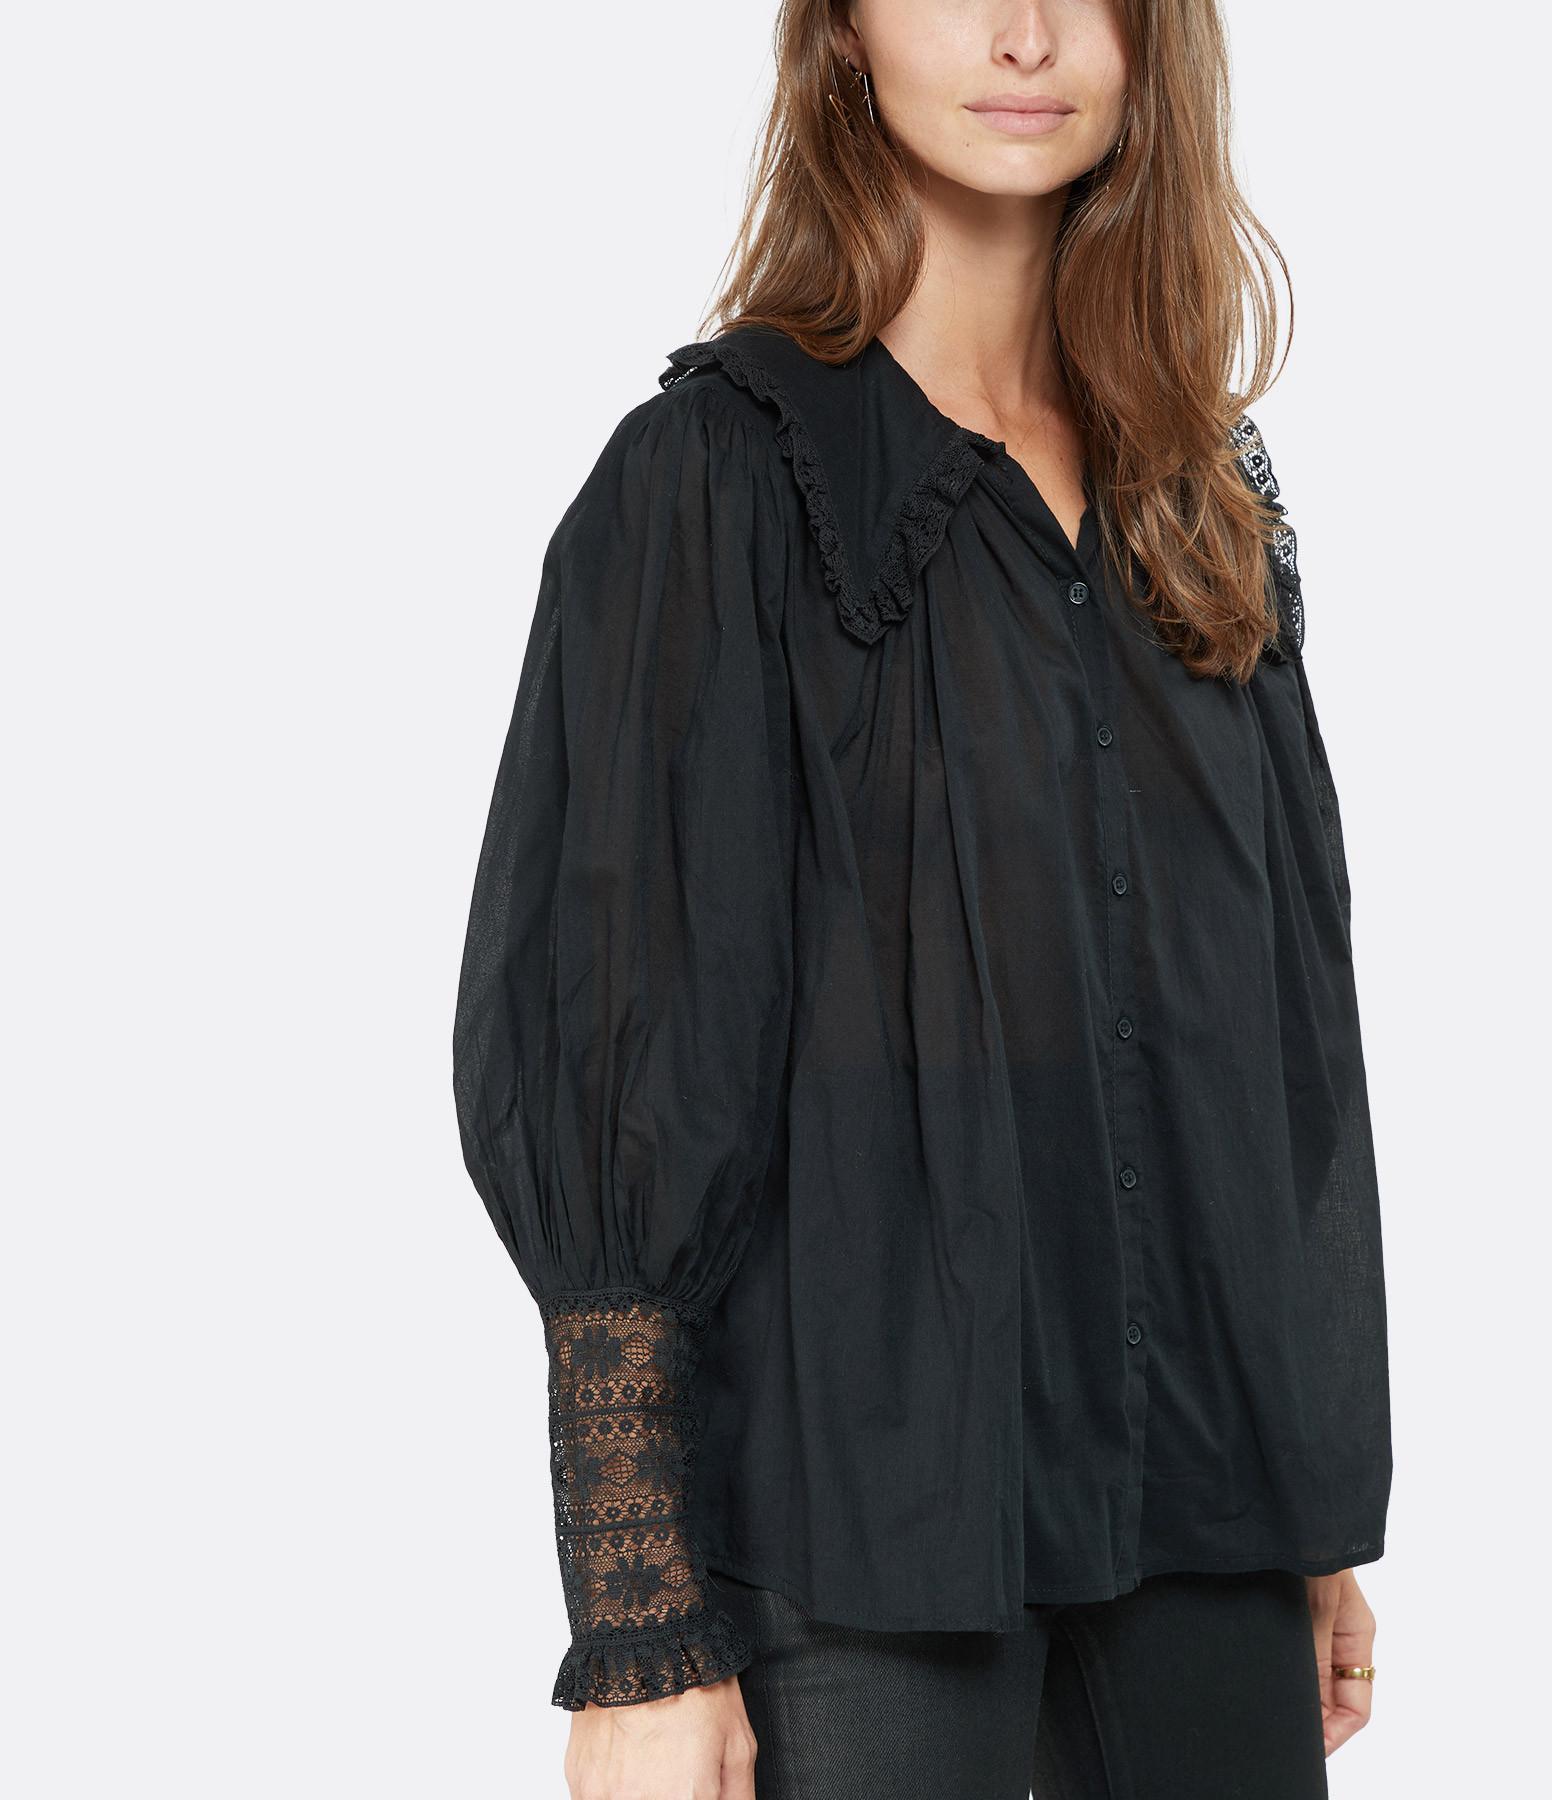 ANTIK BATIK - Blouse Aramis Coton Noir